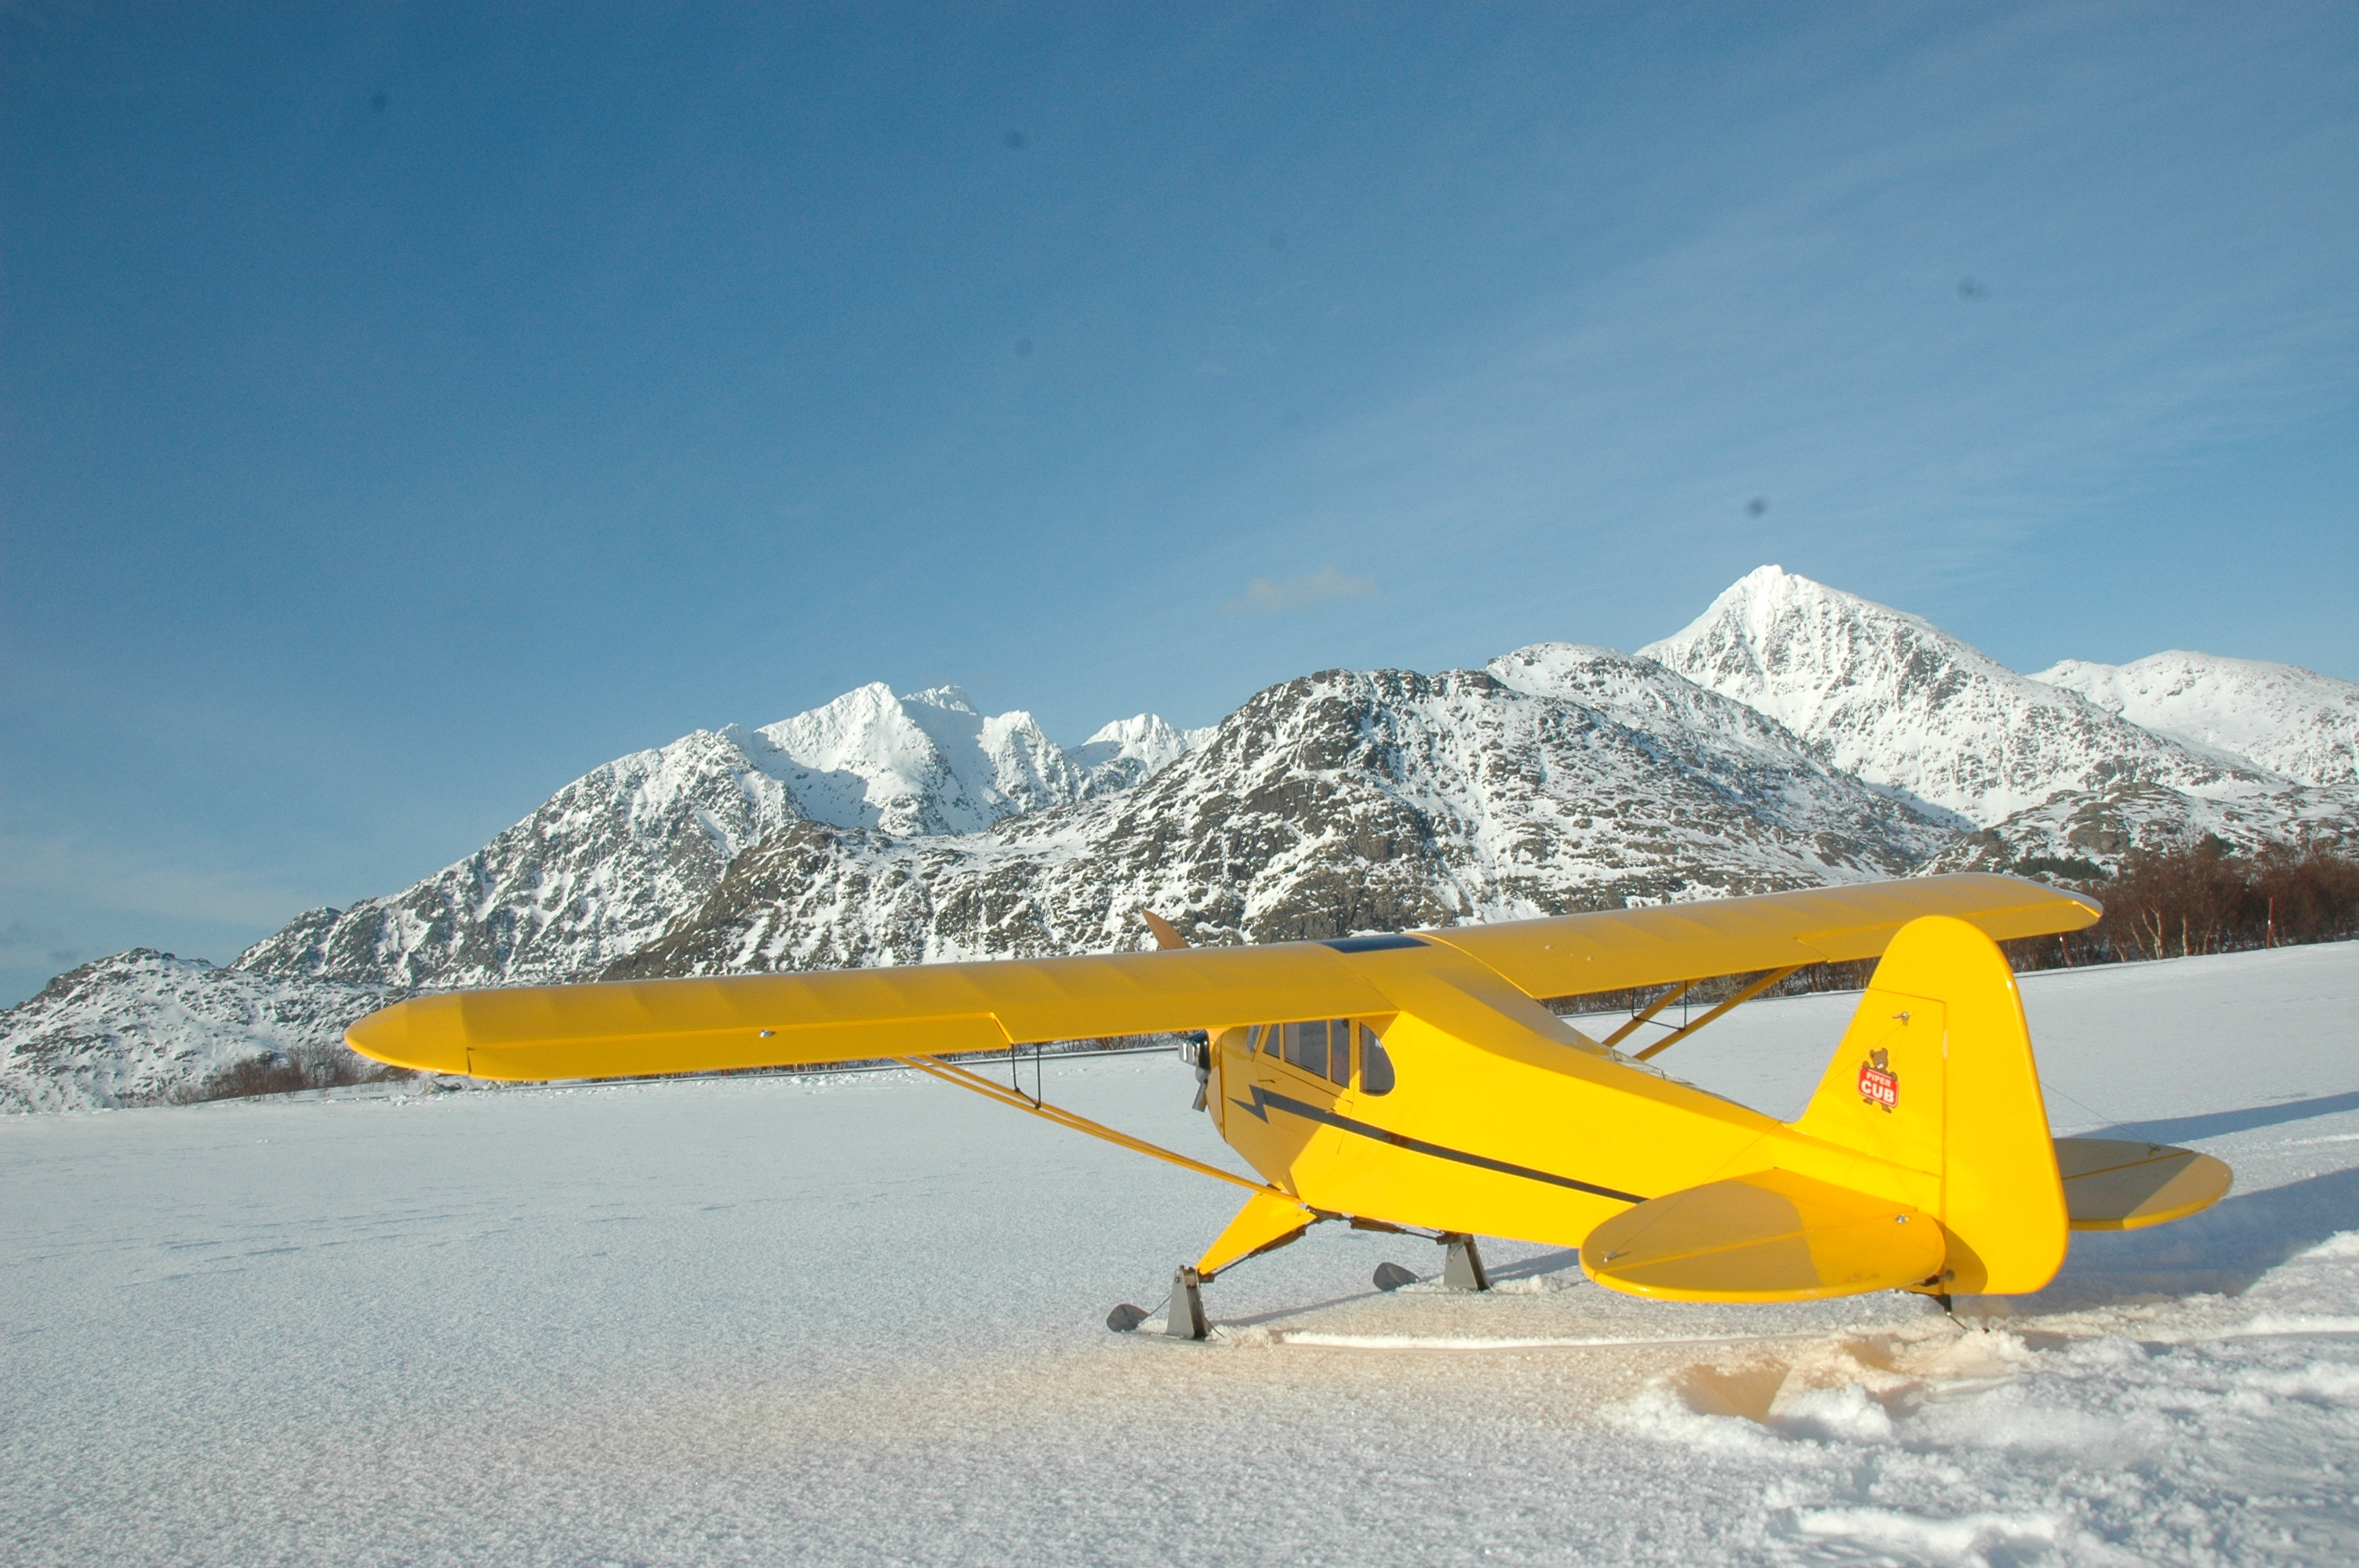 Hobbyking Piper J-3 Cub 1 20 Glow 2310mm (ARF)